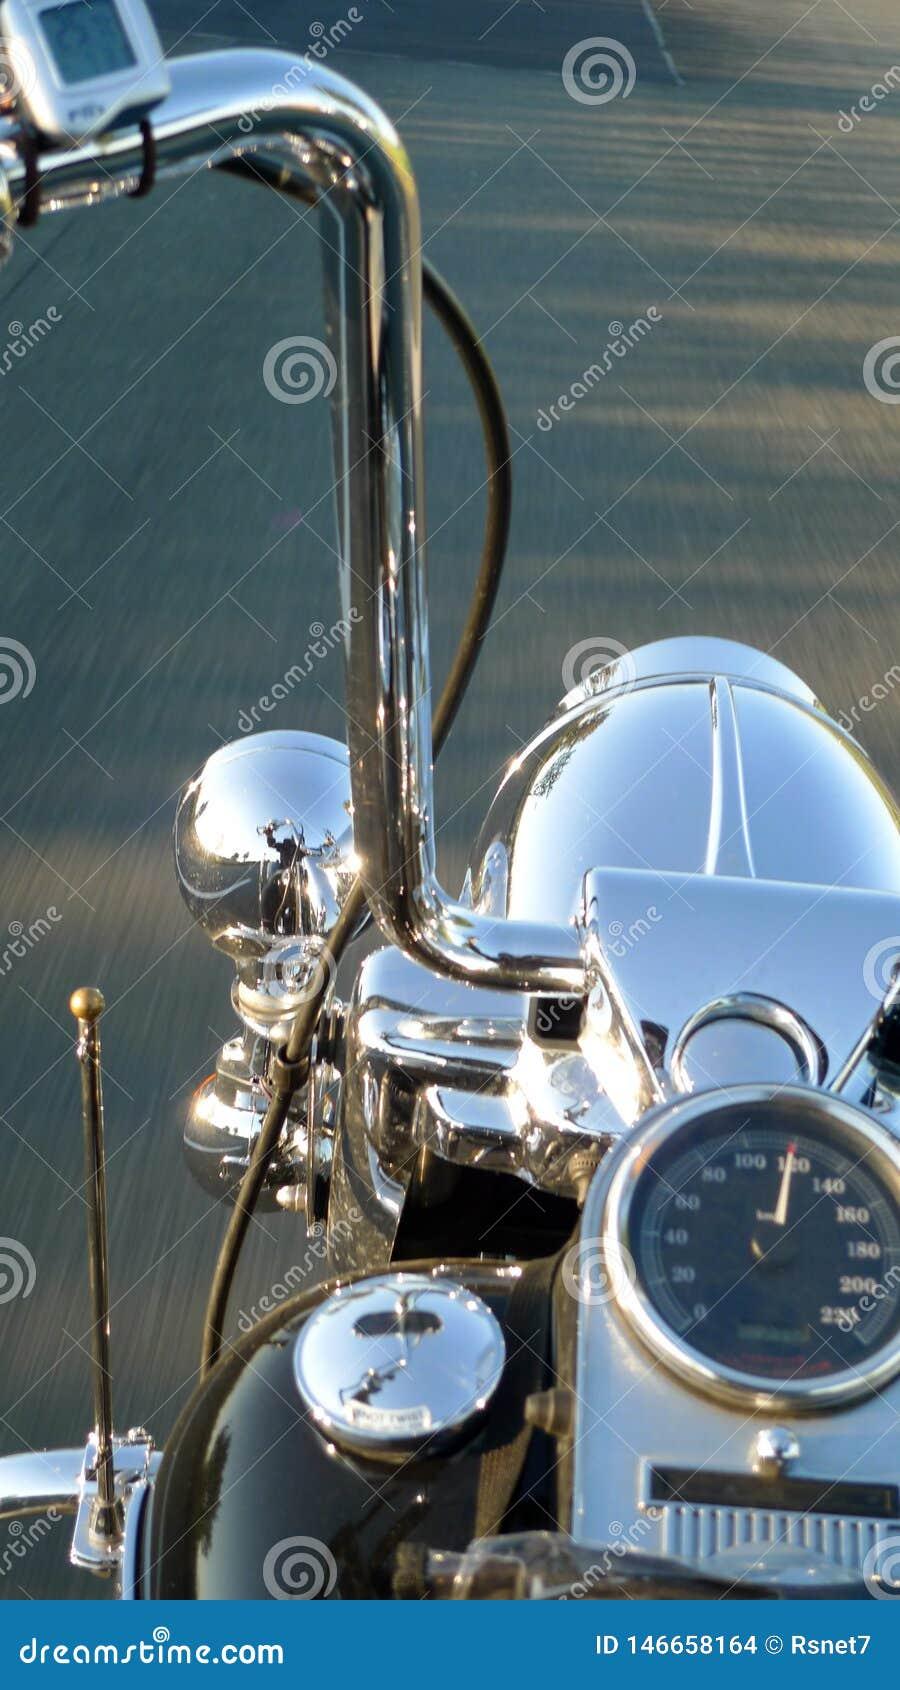 Detail of a motorcycle handlebar